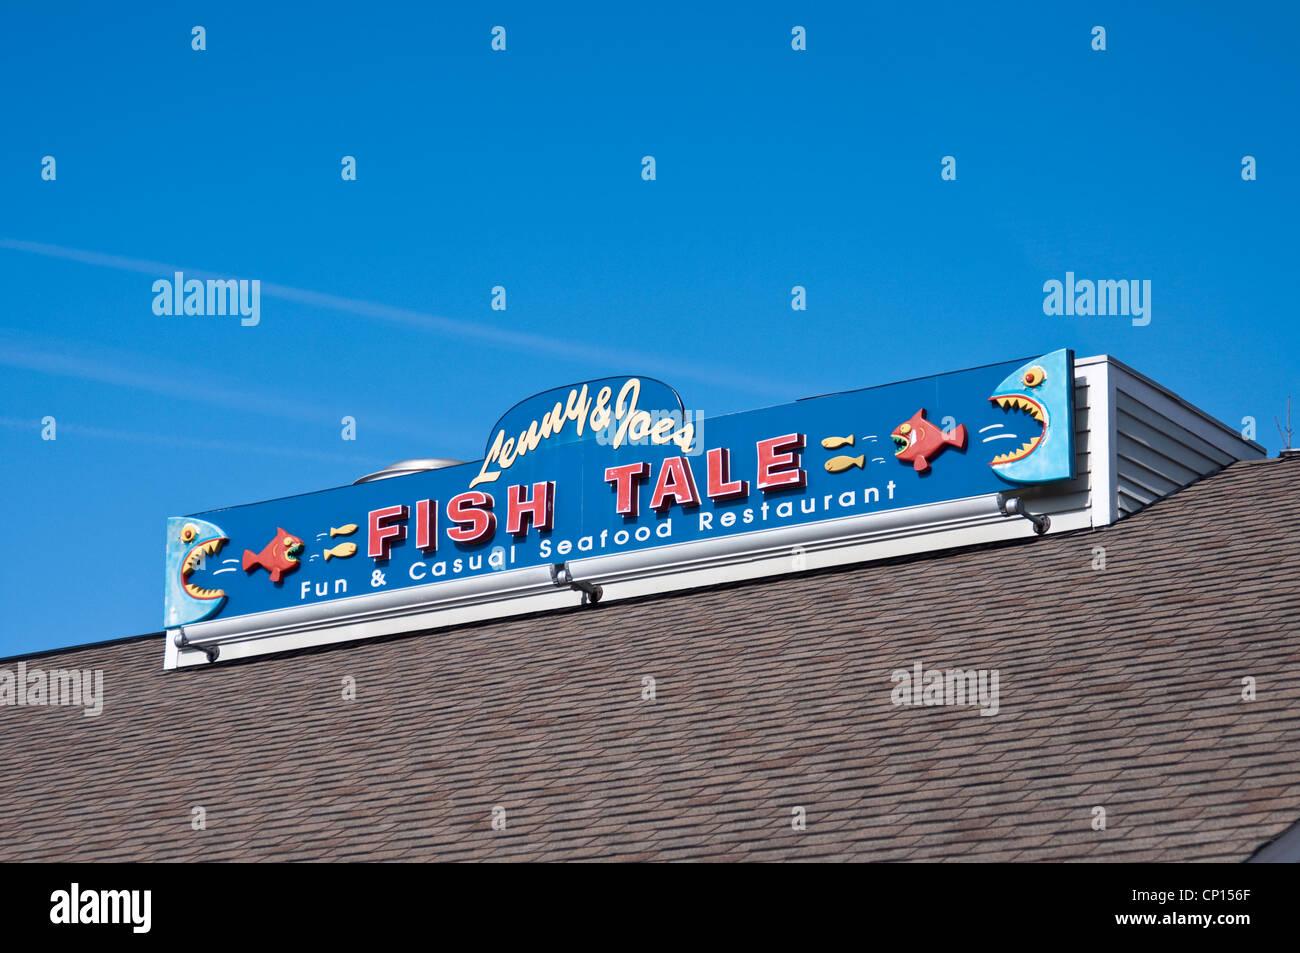 Lenny Joe S Fish Tale Seafood Restaurant In Madison